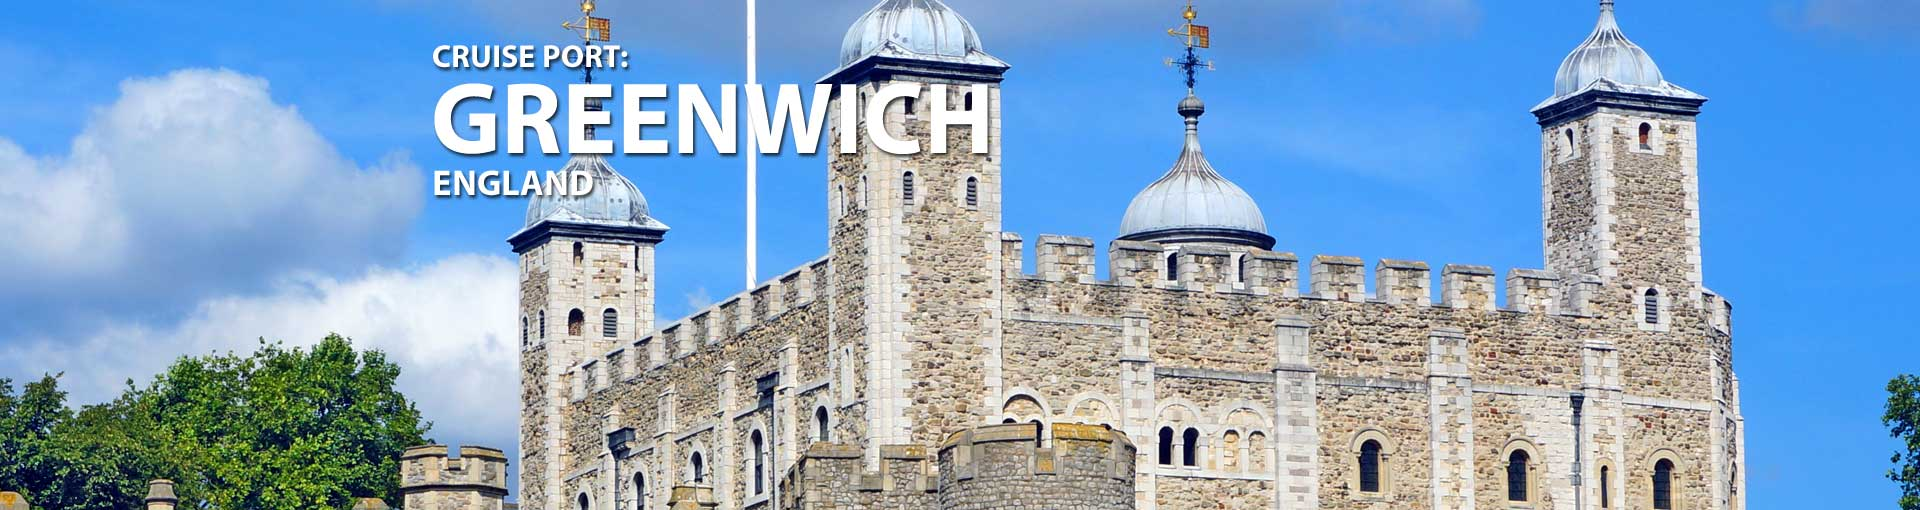 Greenwich, England Cruise Port